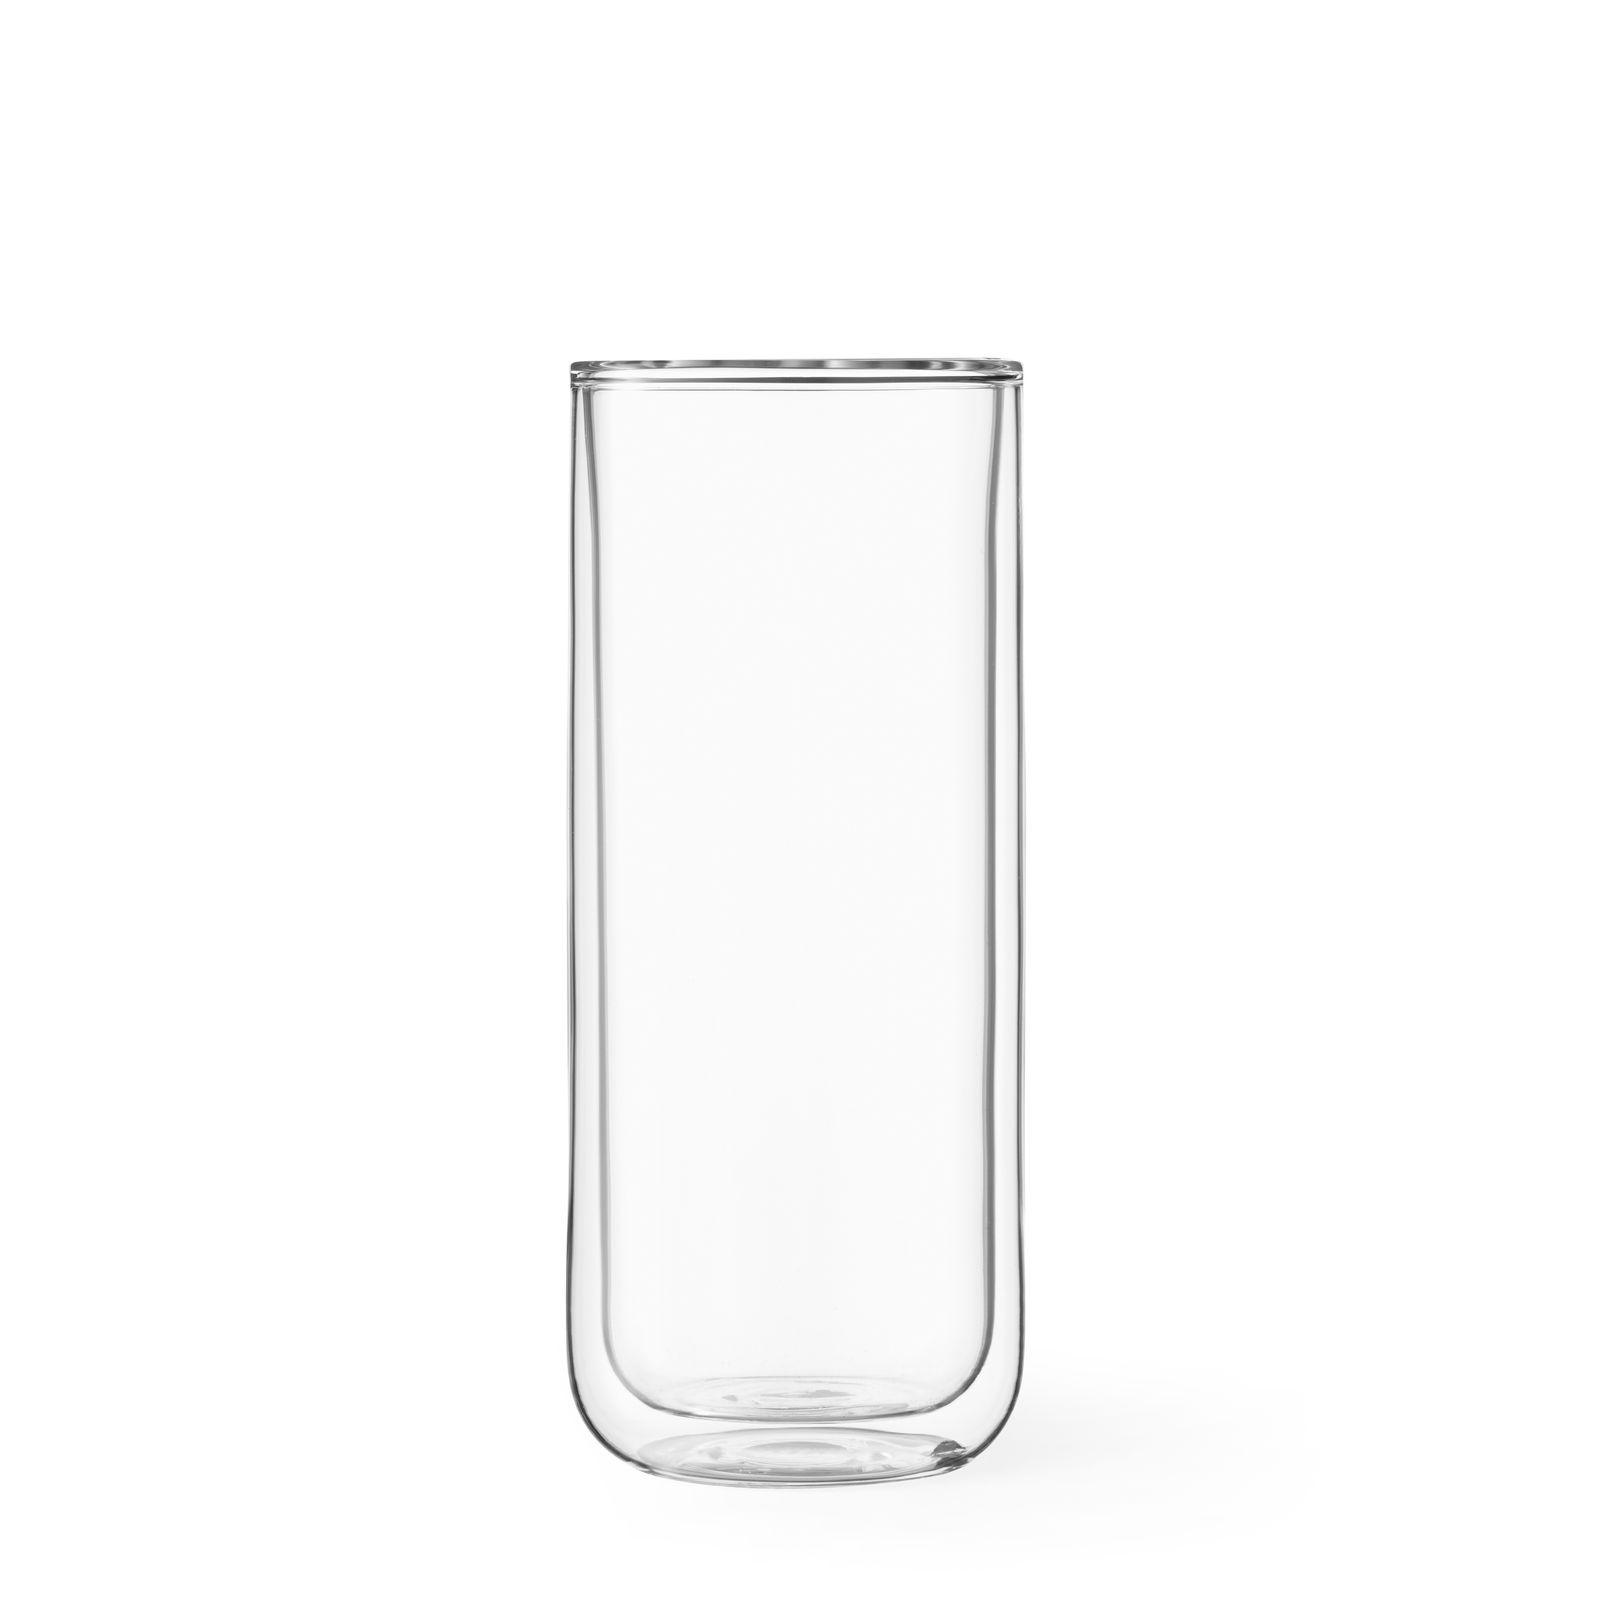 Viva Classic Drinkglas Dubbelwandig 330 ml Set van 2 Stuks